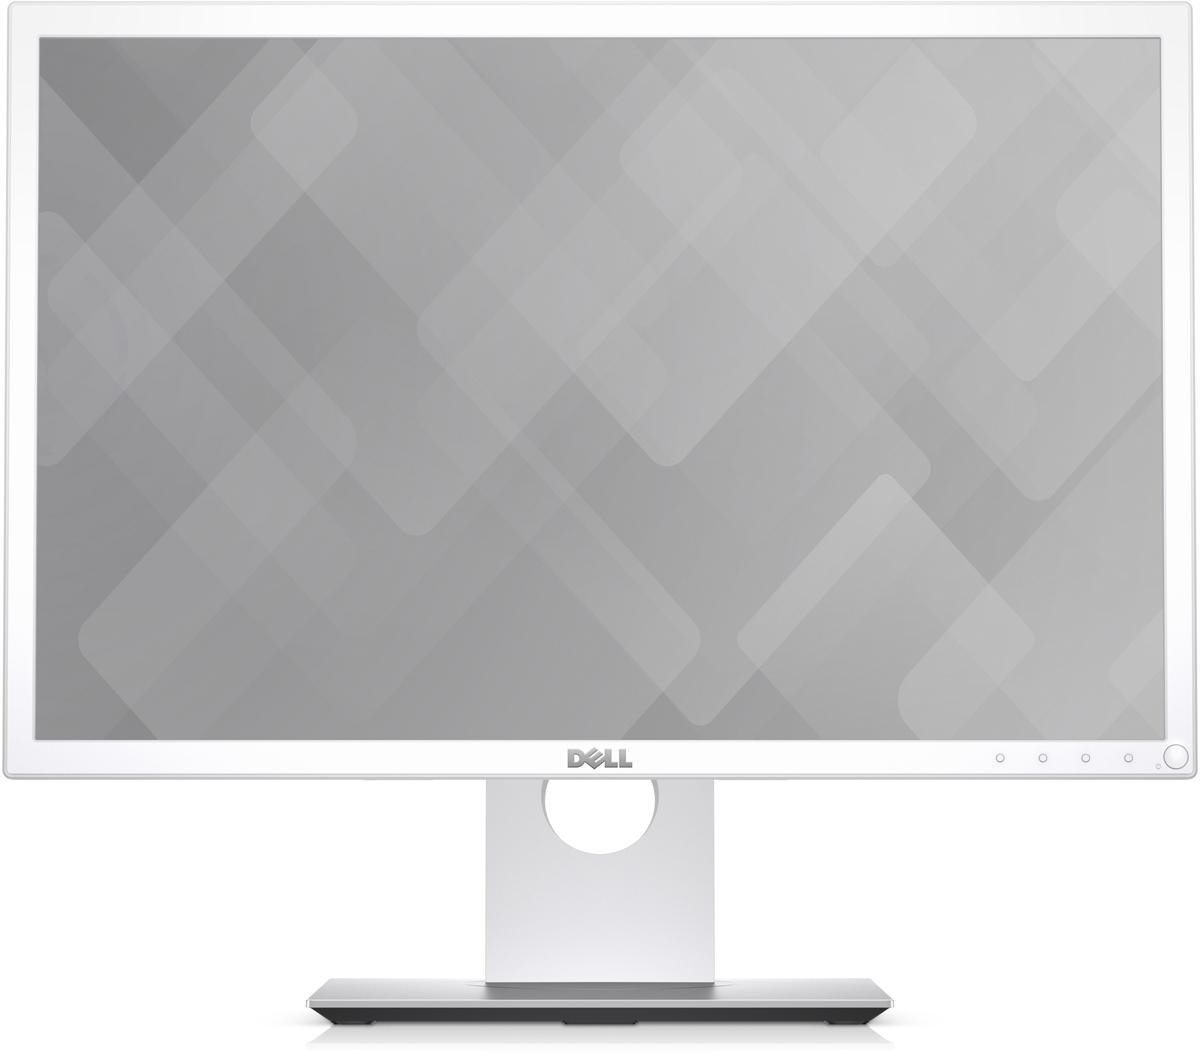 Dell P2217wh, White монитор монитор 22 nec multisync ea223wm silver white tn led 1680x1050 5ms vga dvi displayport